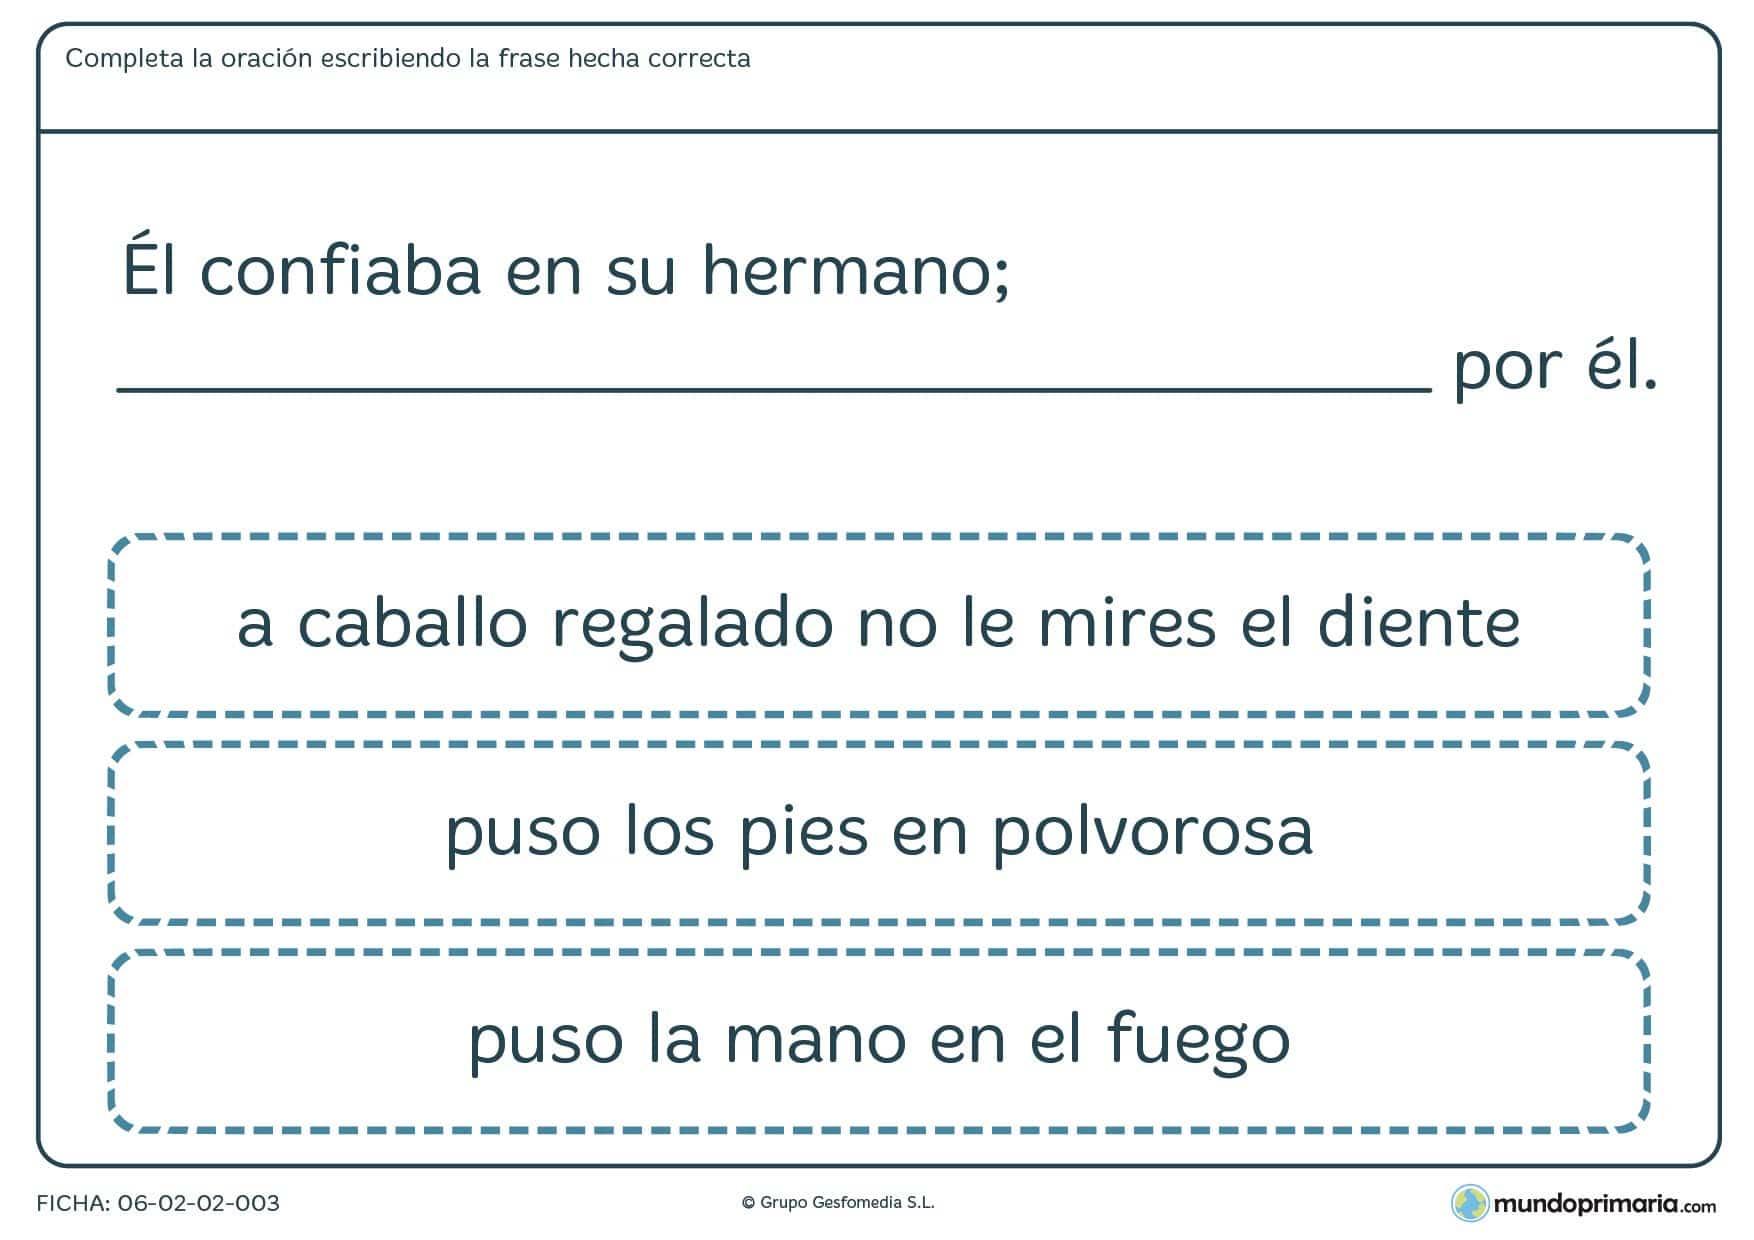 Ficha de lenguaje sobre refranes para alumnos de 4º de Primaria